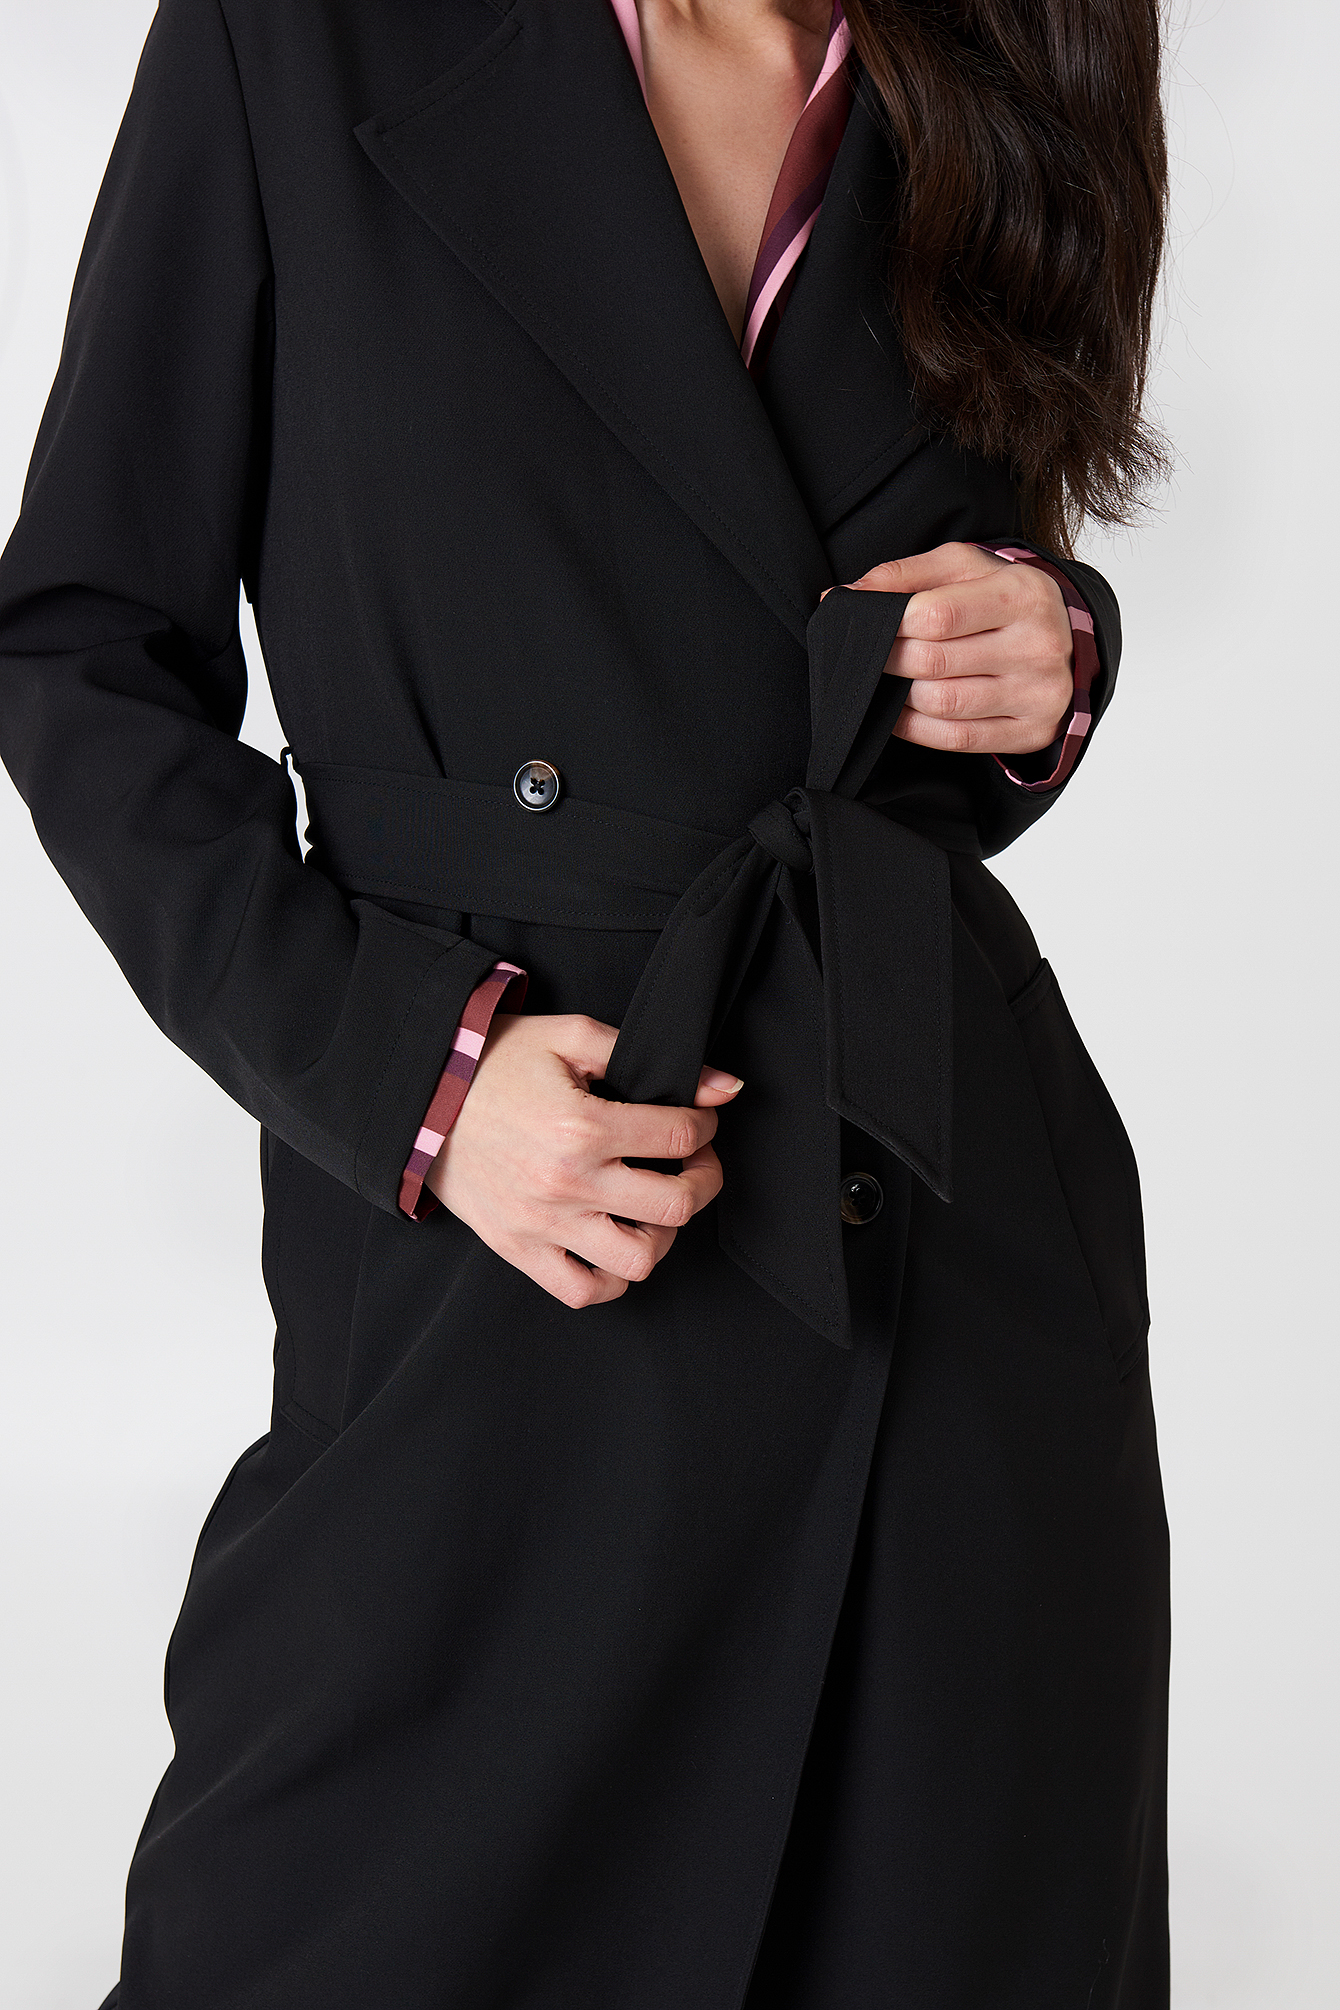 coats women s winter coats